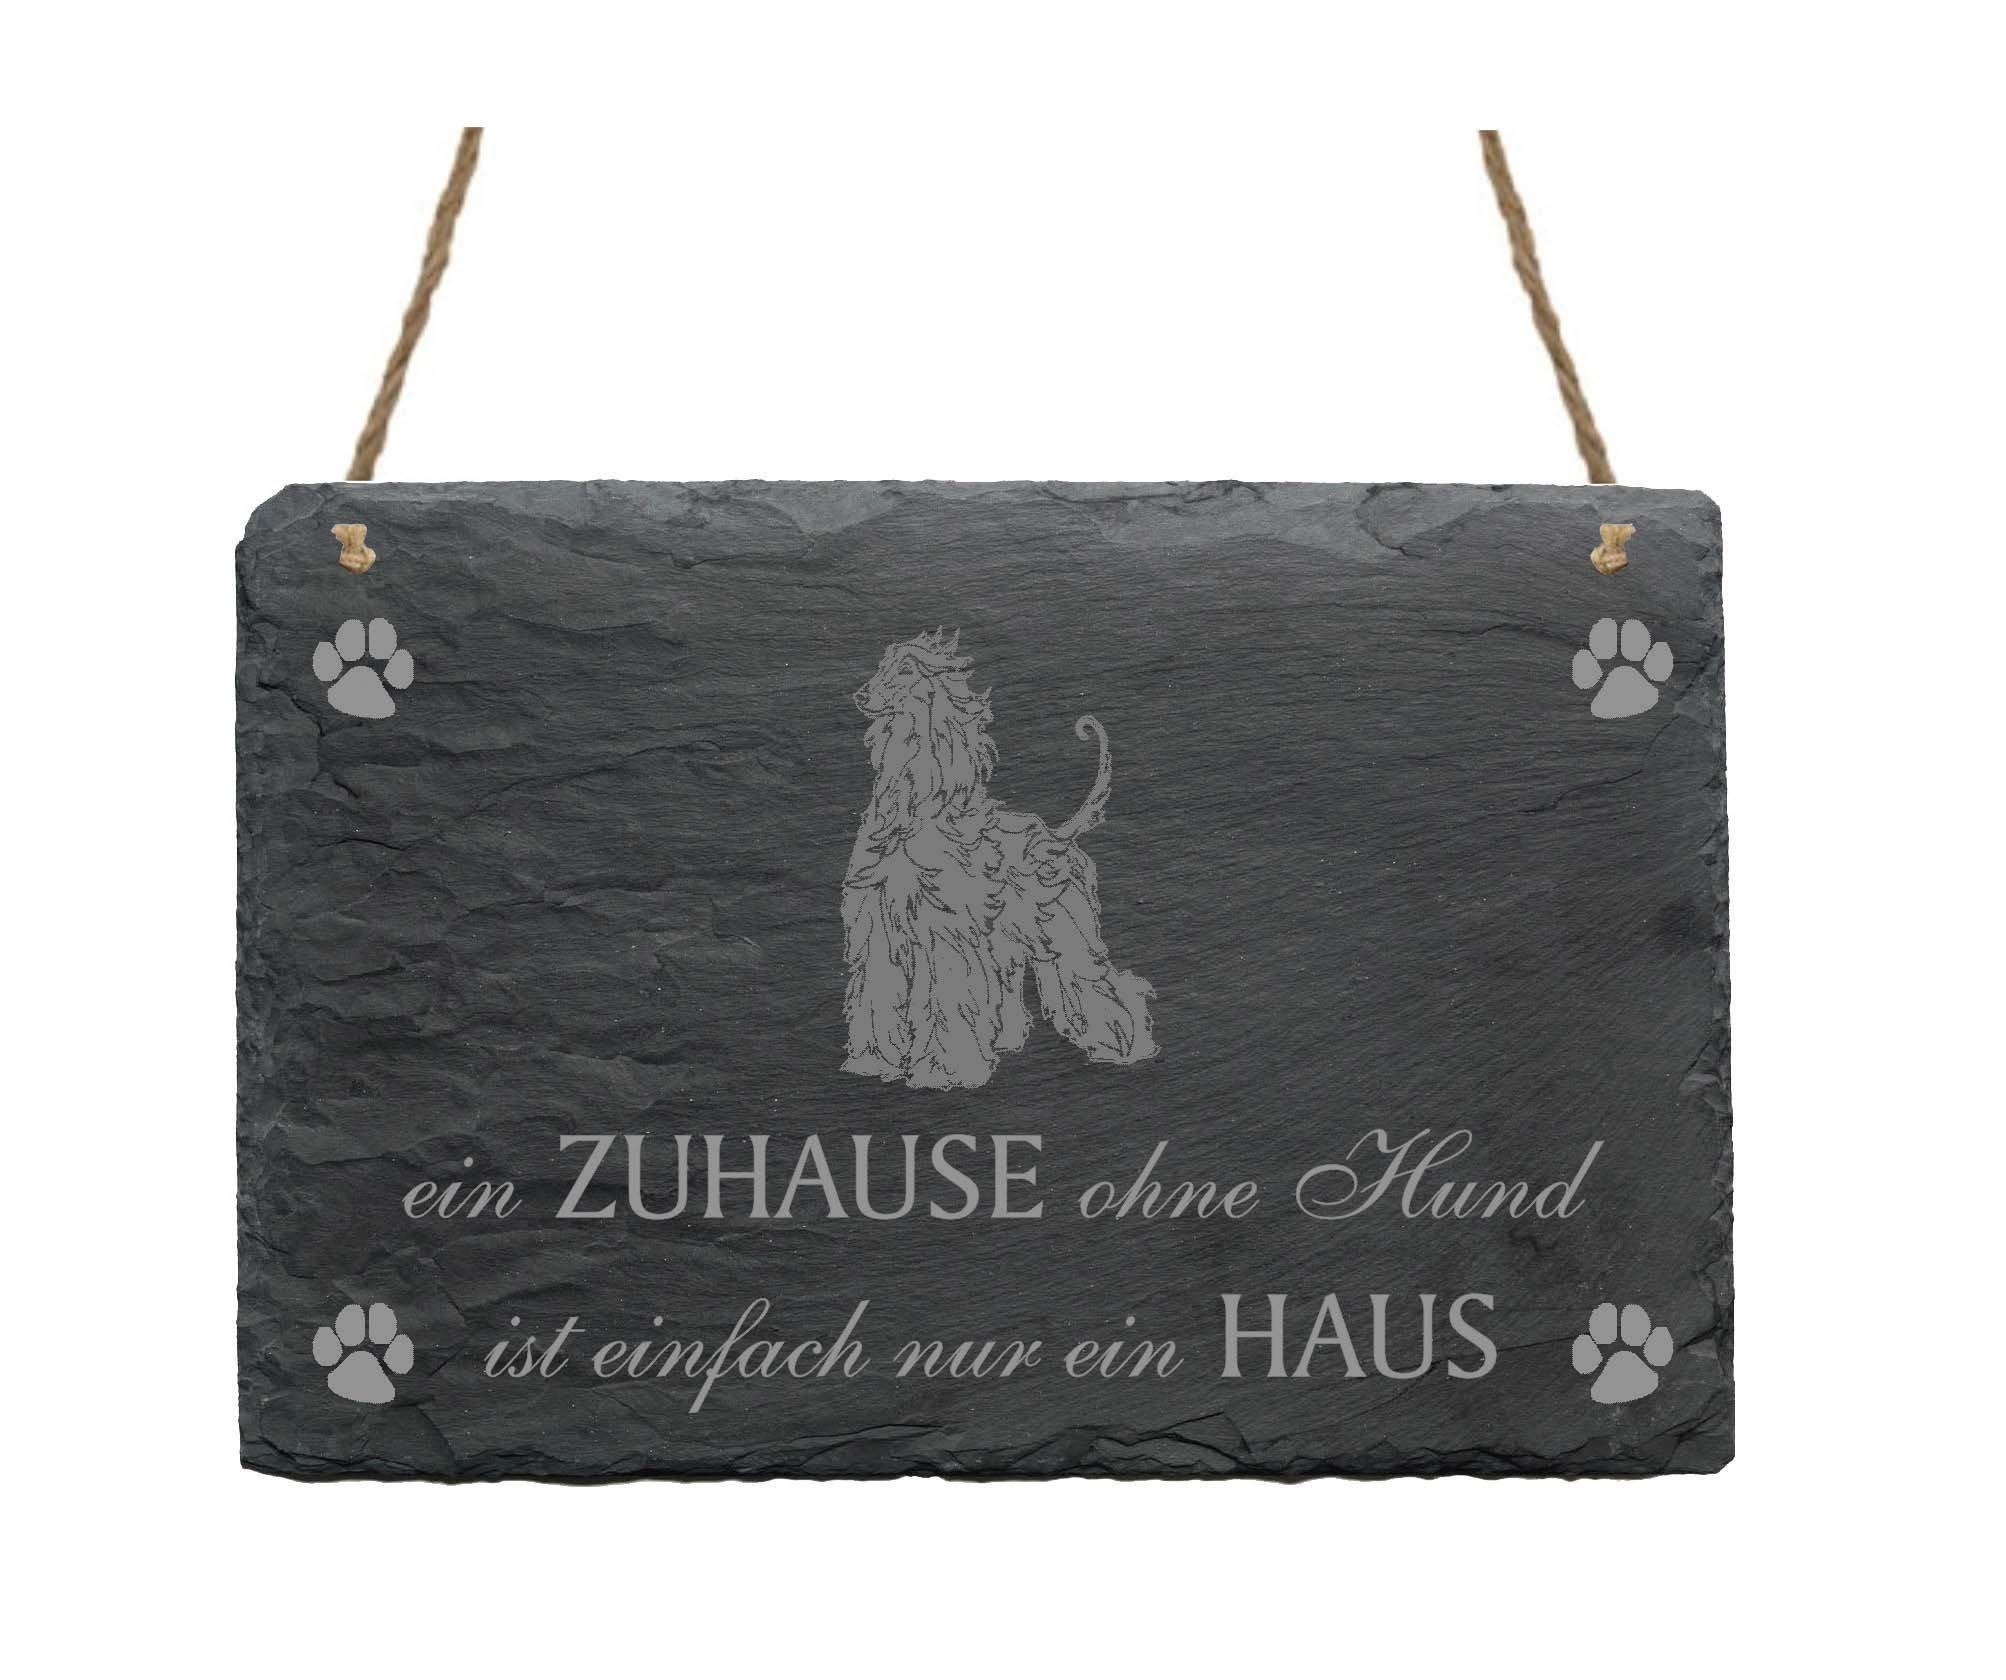 Afghan Hound Dog Slate Plaque Sign 'A home without a dog is just a house' 2Slate Sign Afghan Hound Dog Clip On Back Cover